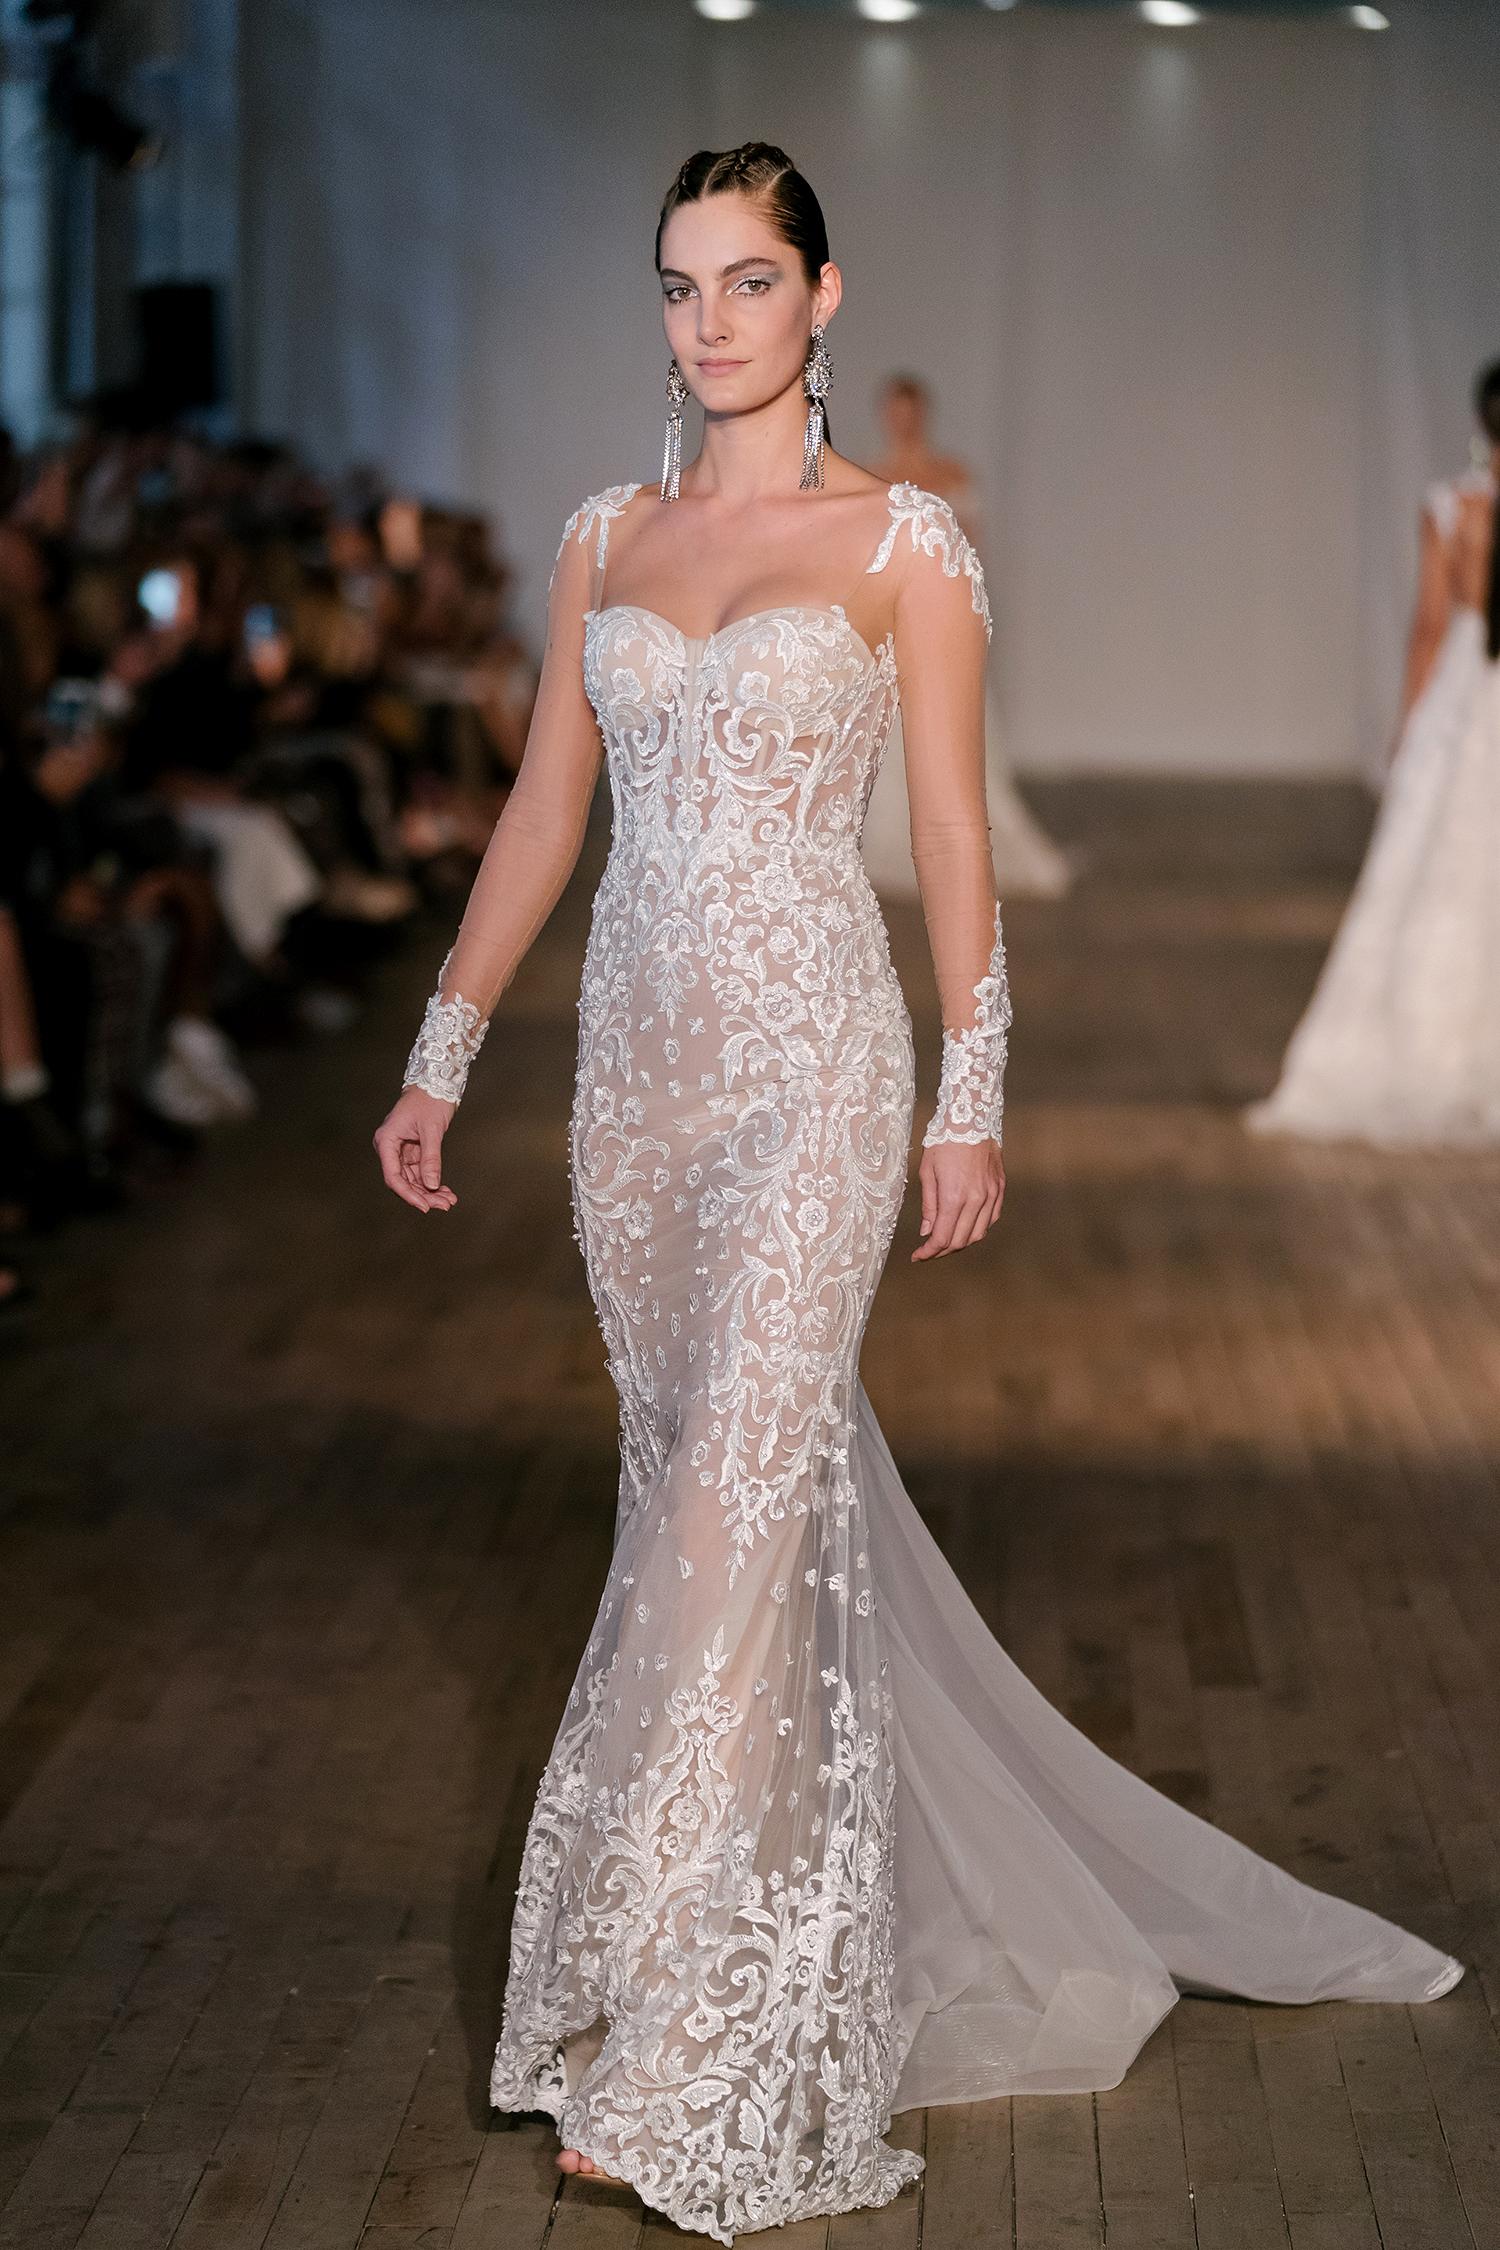 berta wedding dress spring 2019 lace sheer long-sleeved sheath